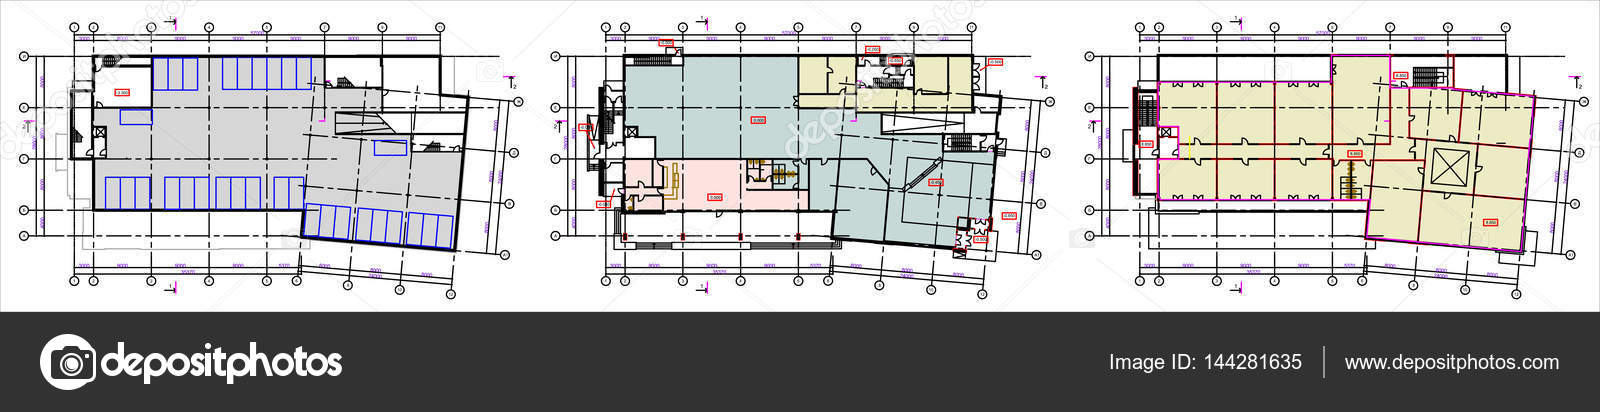 floor plan office furniture symbols. Standard Office Furniture Symbols On Floor Plans \u2014 Stock Vector Plan R